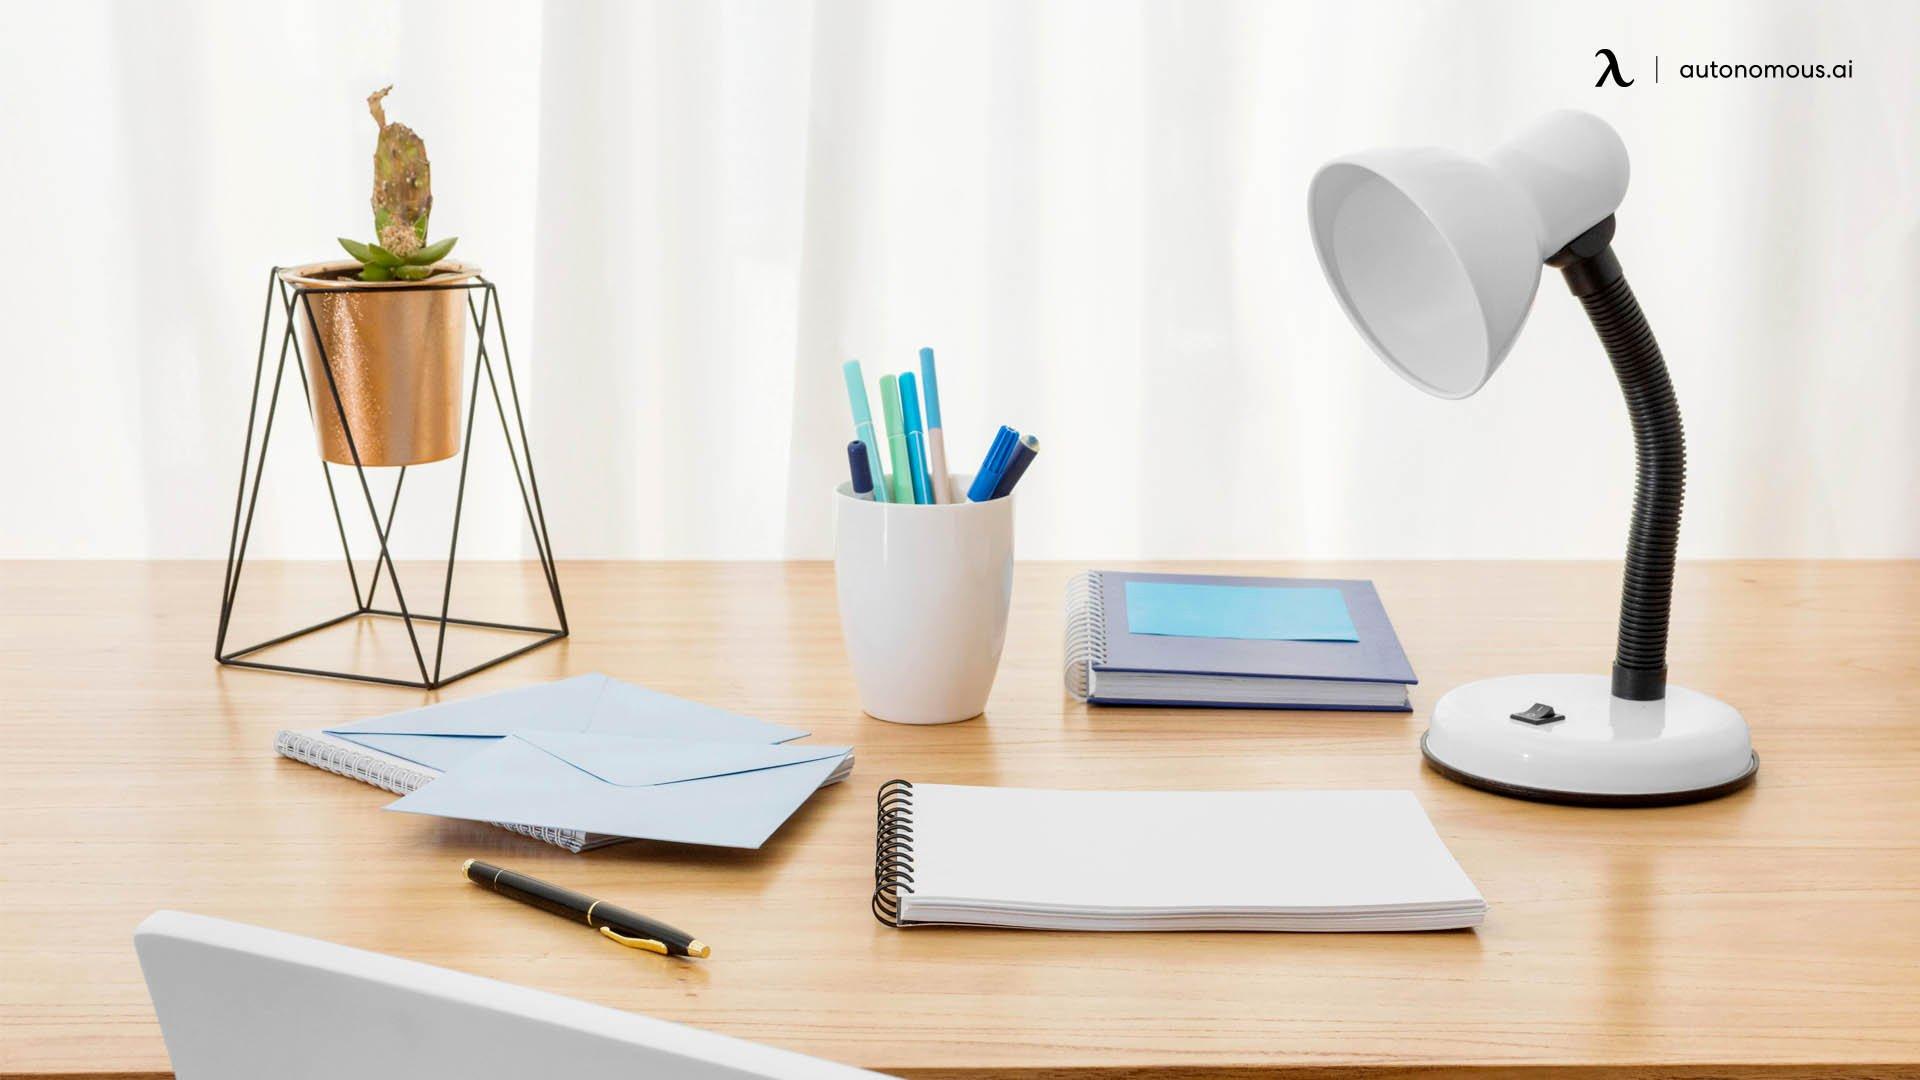 Best Desk Lamp for Eyes: Buying Guide